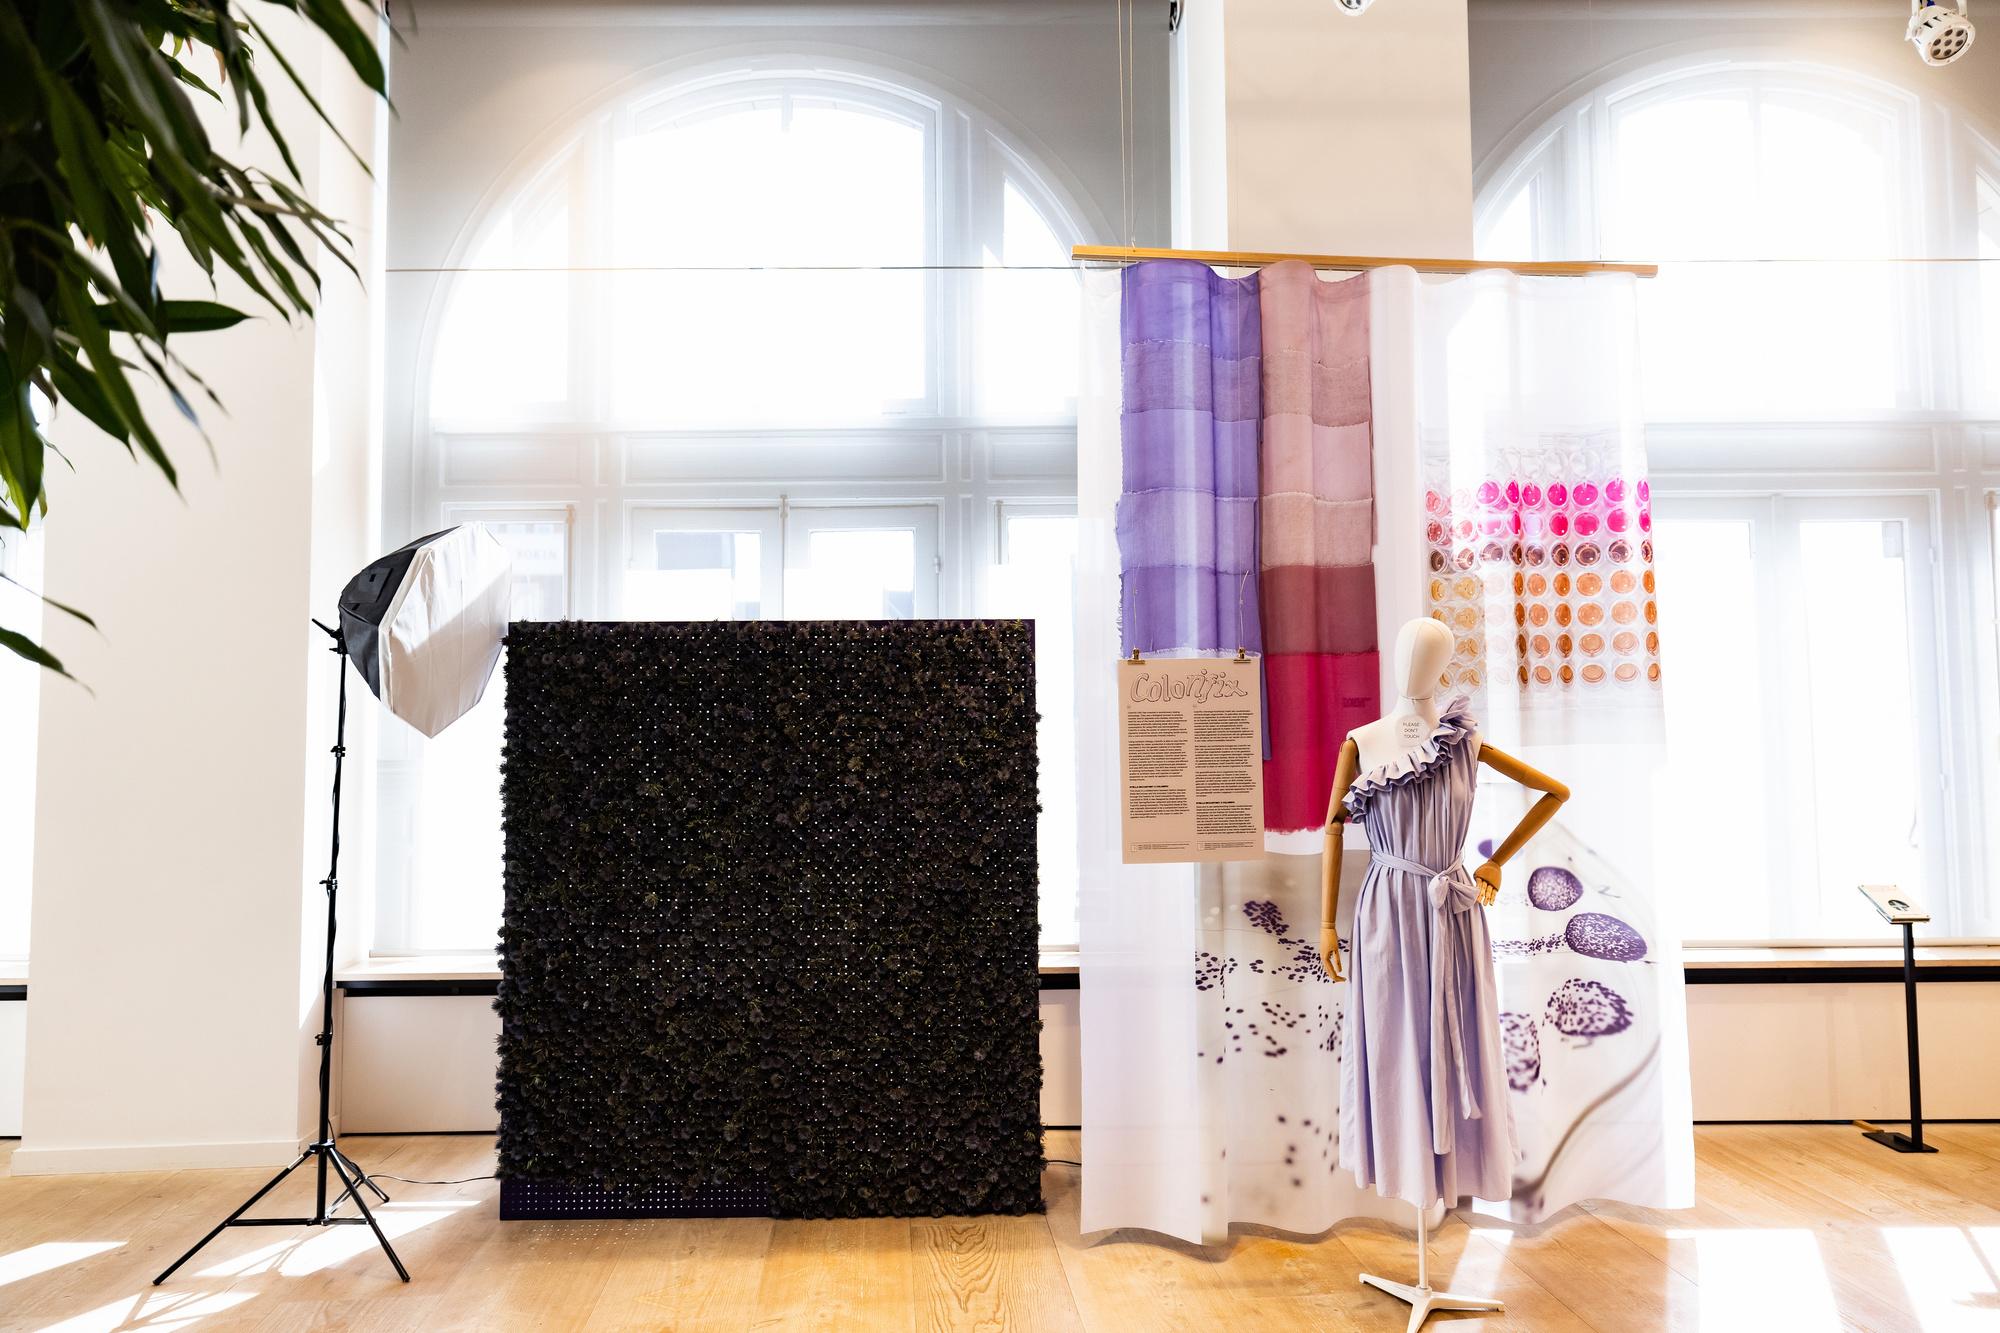 De jurk van Stella McCartney in samenwerking met Colorifix, Alina Krasieva